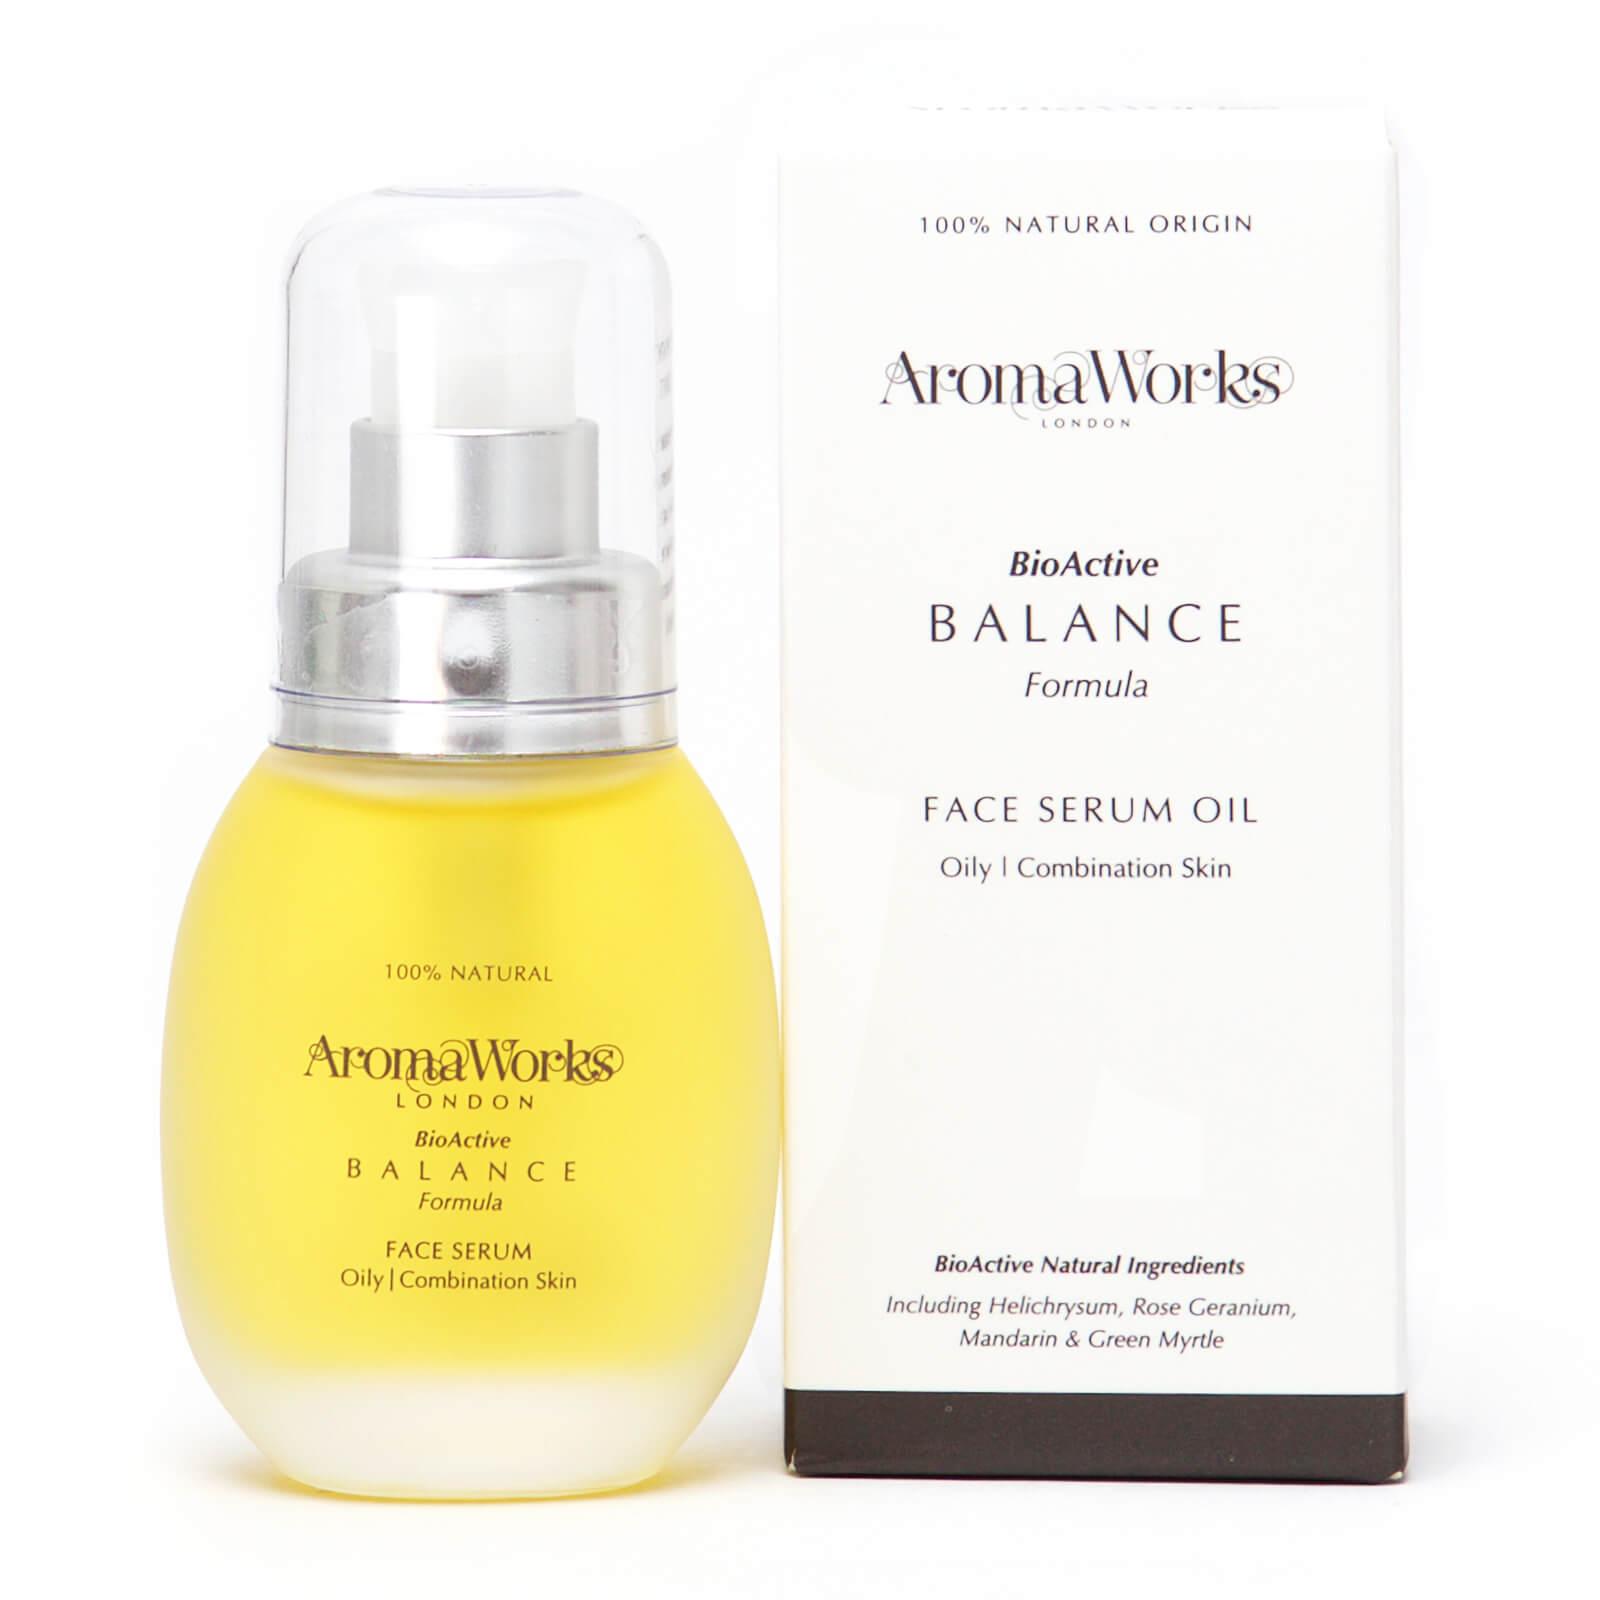 AromaWorks Balance siero oleoso per il viso 30 ml